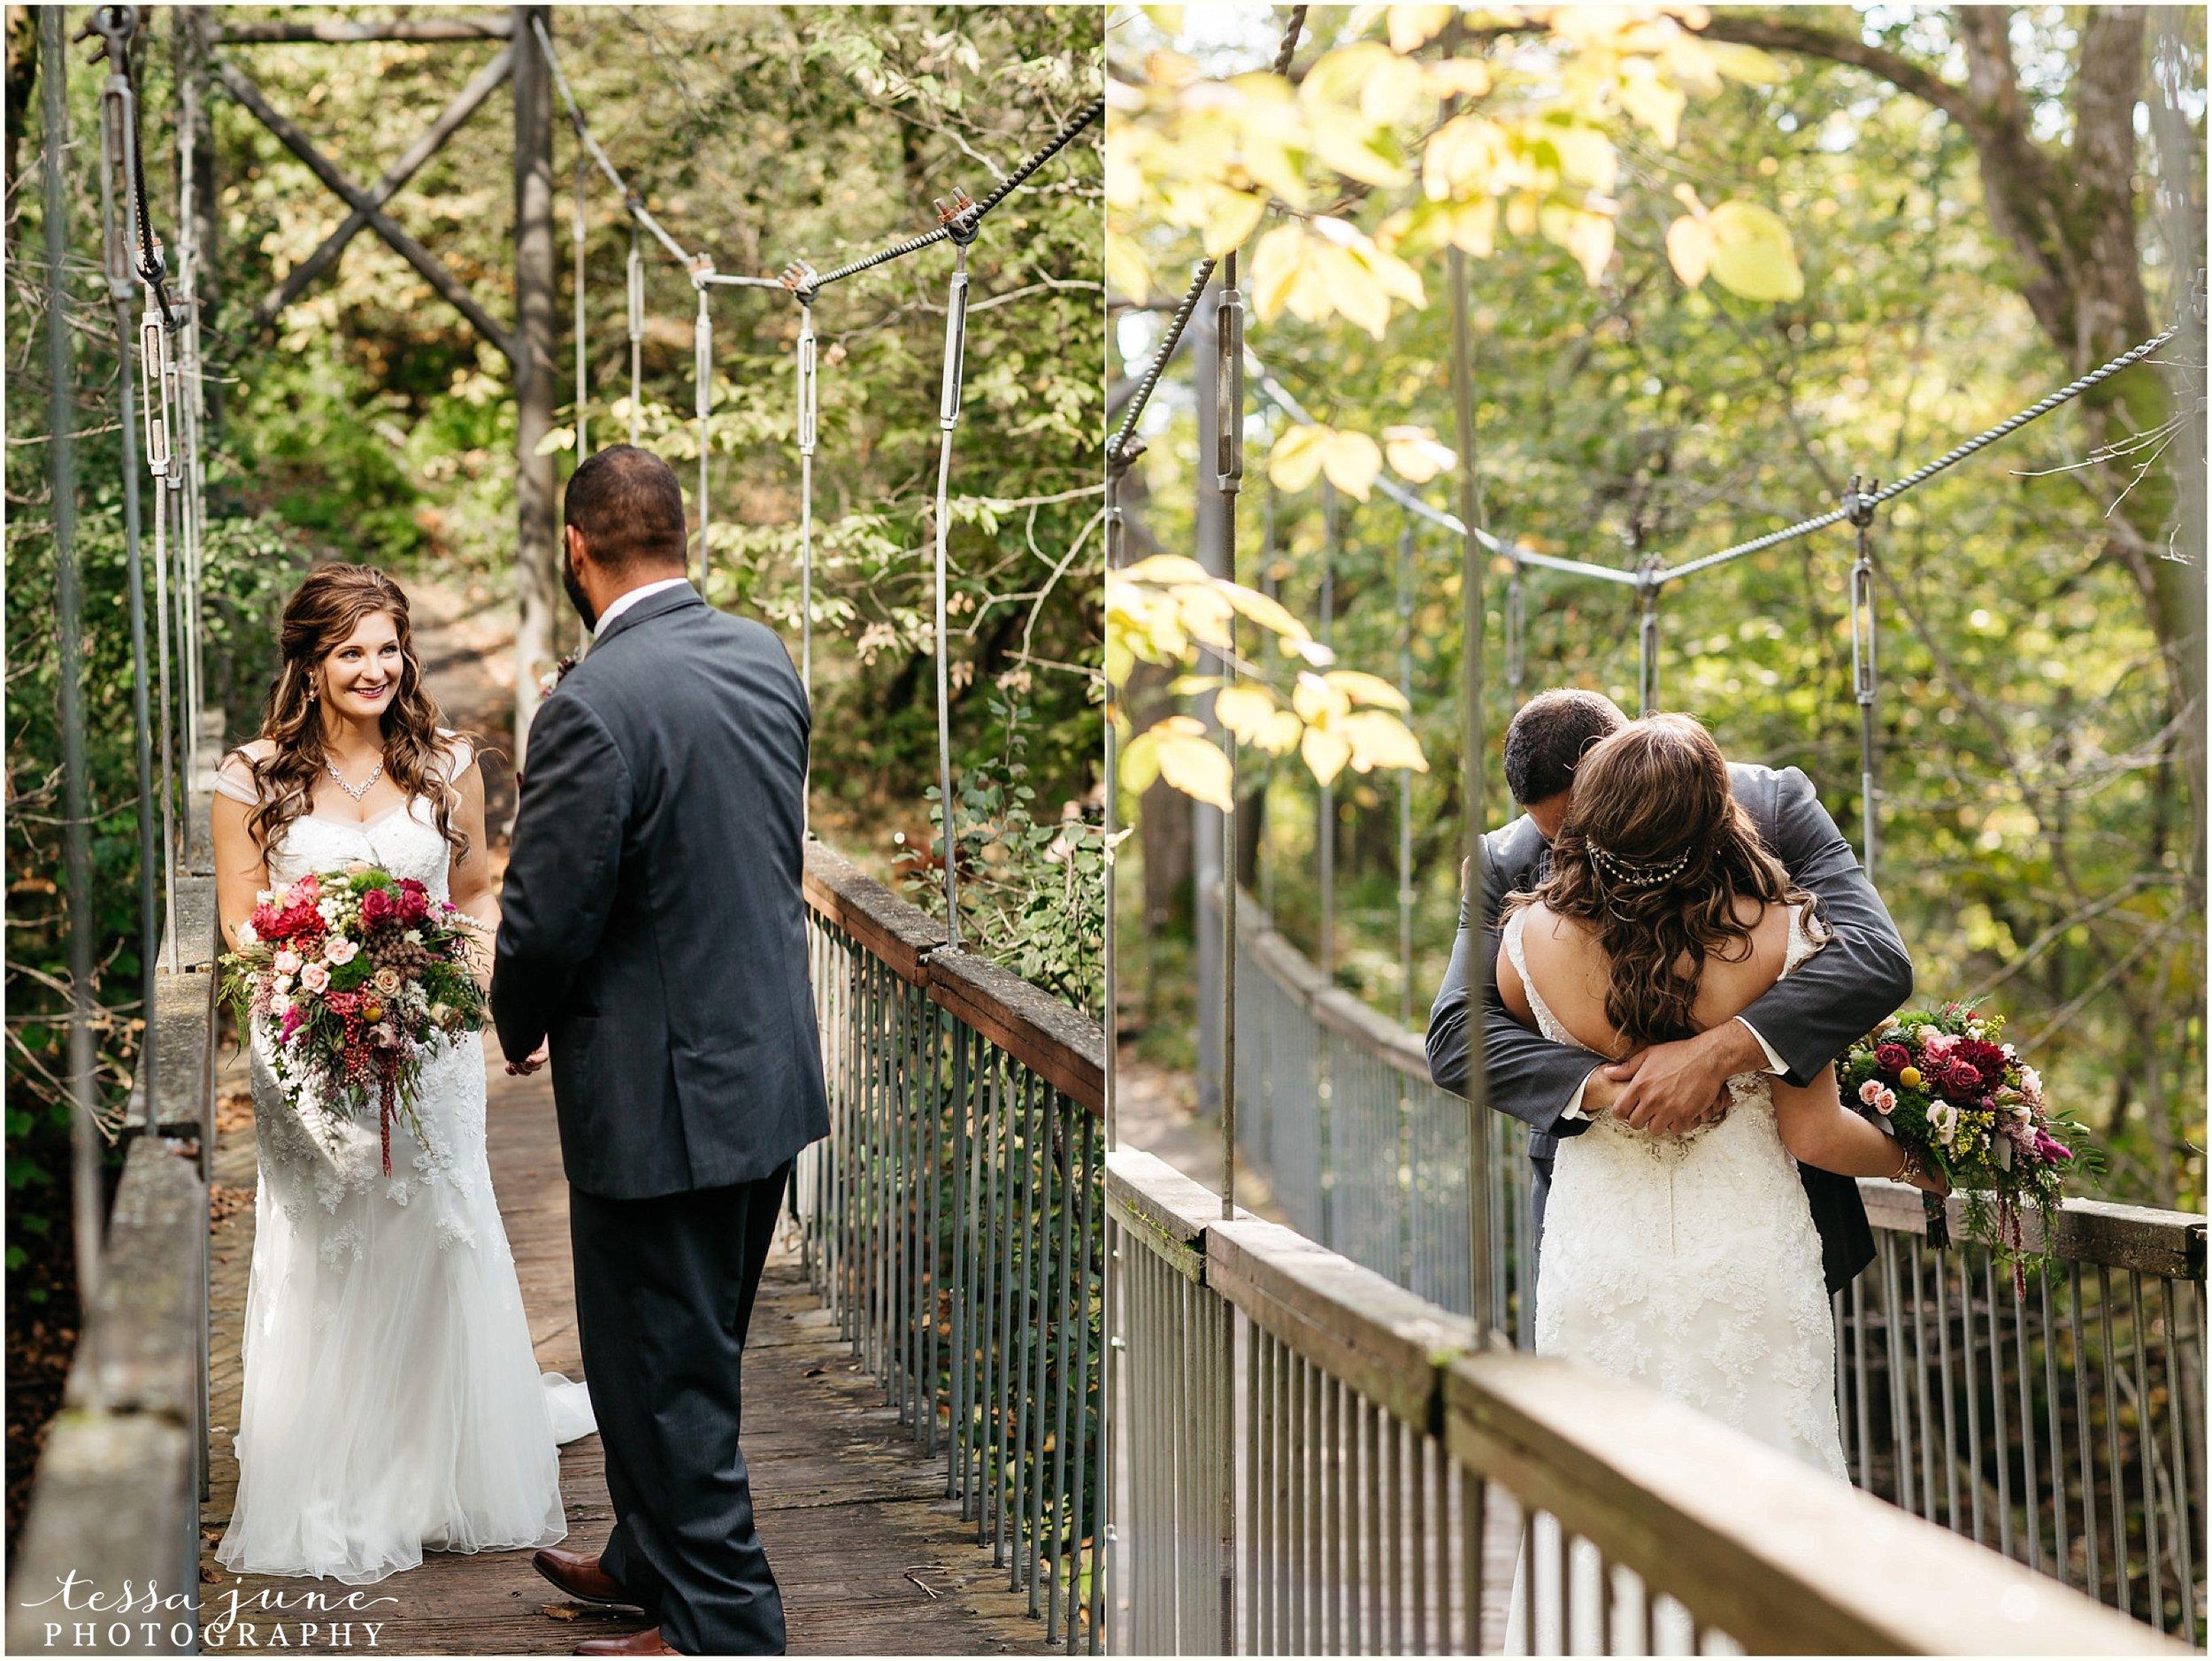 bohemian-minnesota-wedding-mismatched-bridesmaid-dresses-waterfall-st-cloud-tessa-june-photography-40.jpg